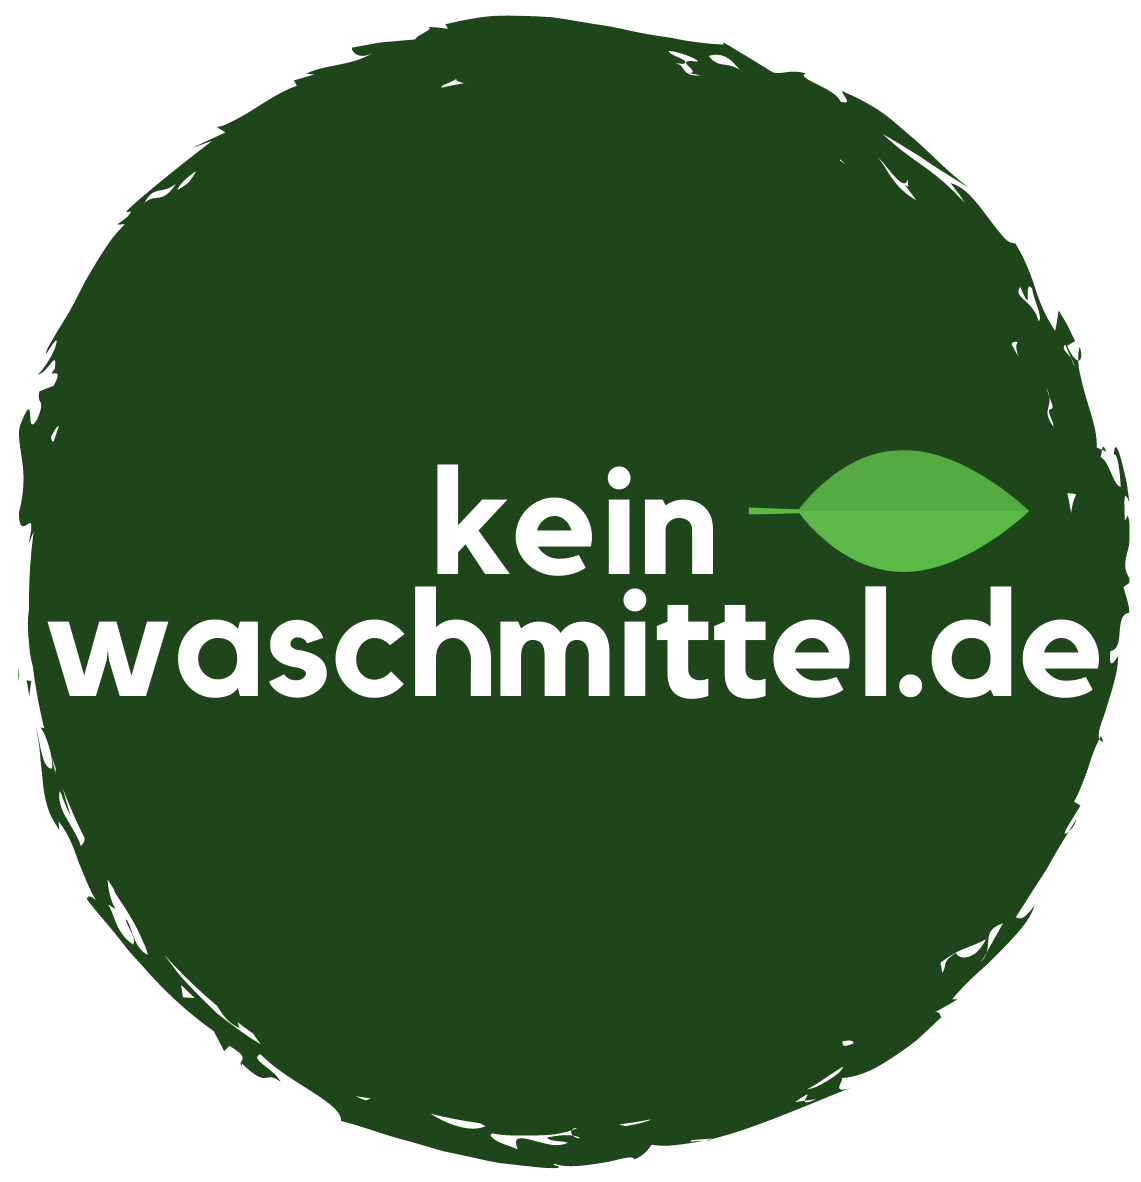 keinwaschmittel.de